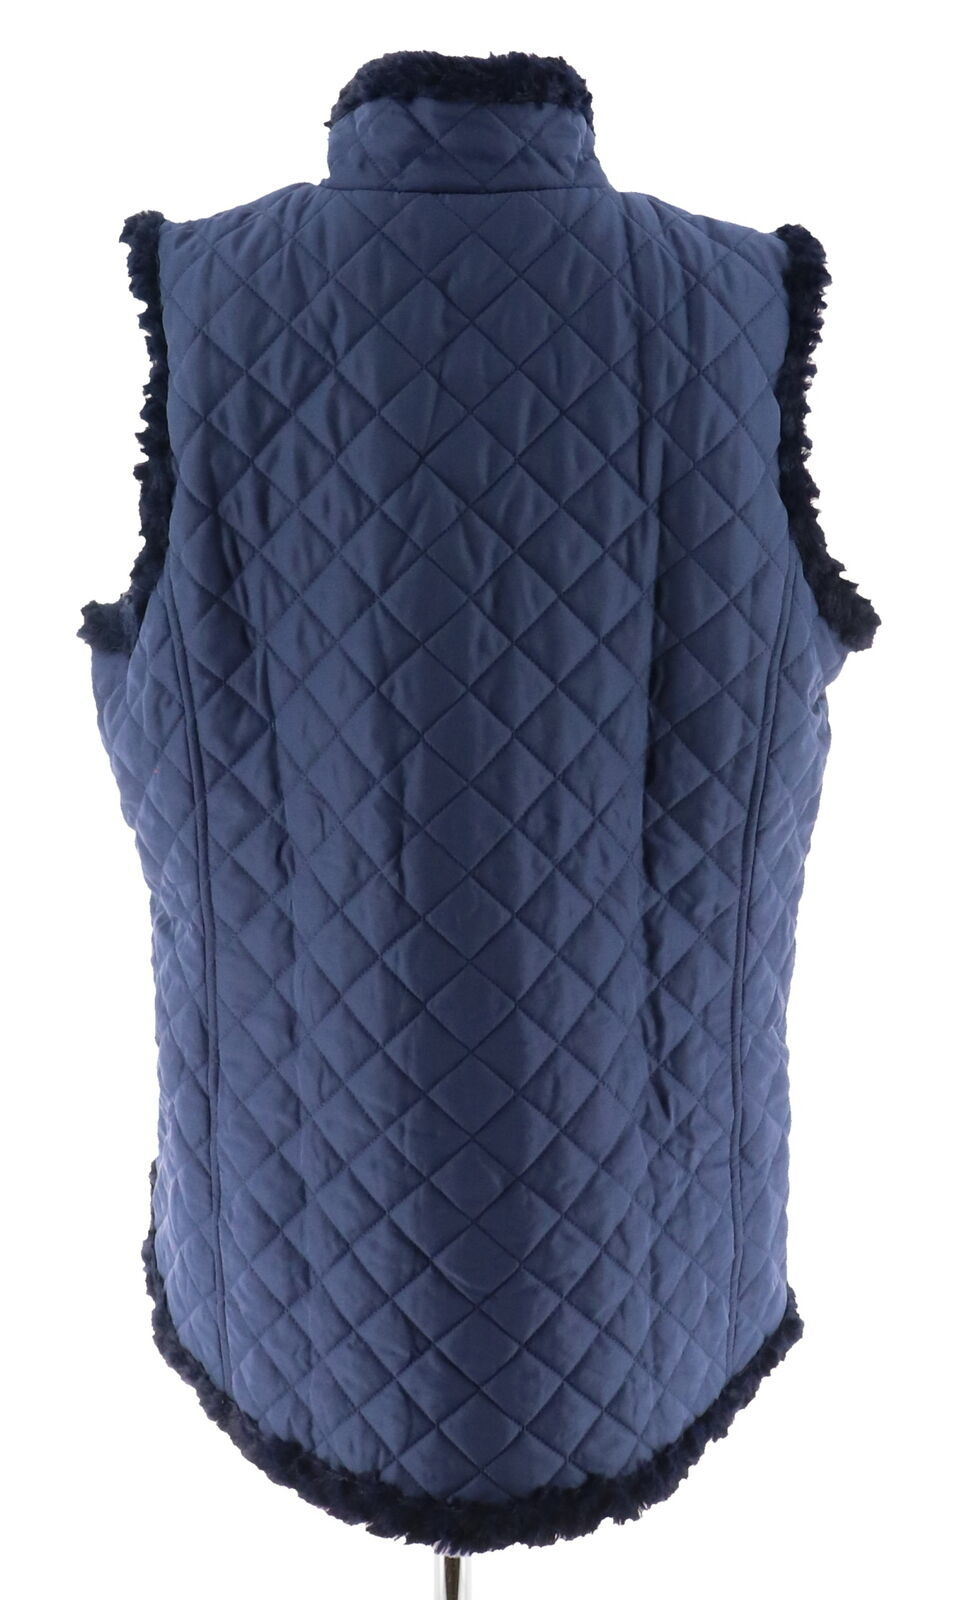 Denim & Co Reversible Zip Front Textured Quilted Vest Dark Indigo M NEW A282681 image 3